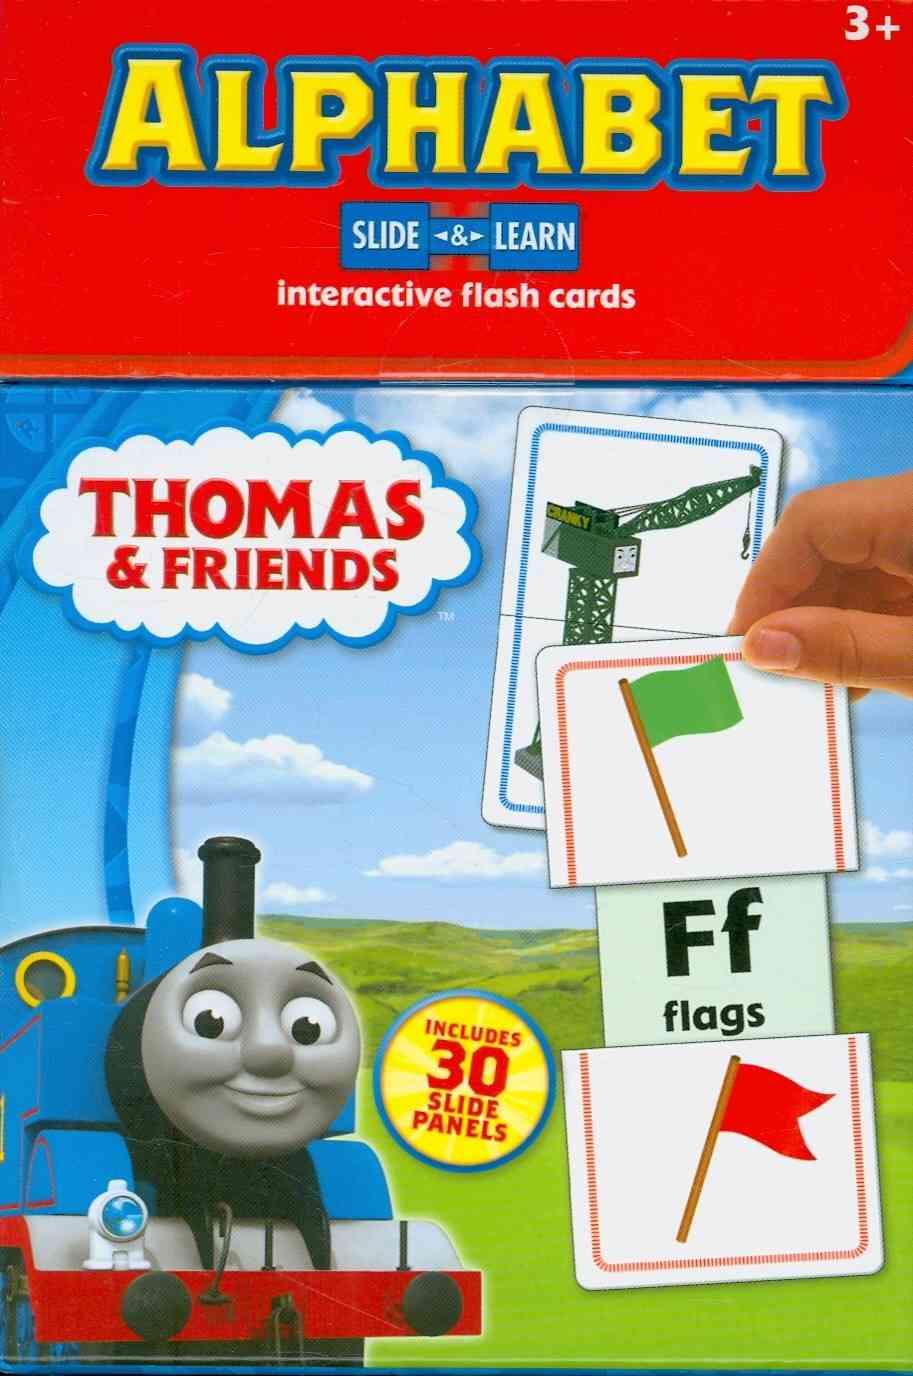 Thomas & Friends Alphabet Slide & Learn (Cards)